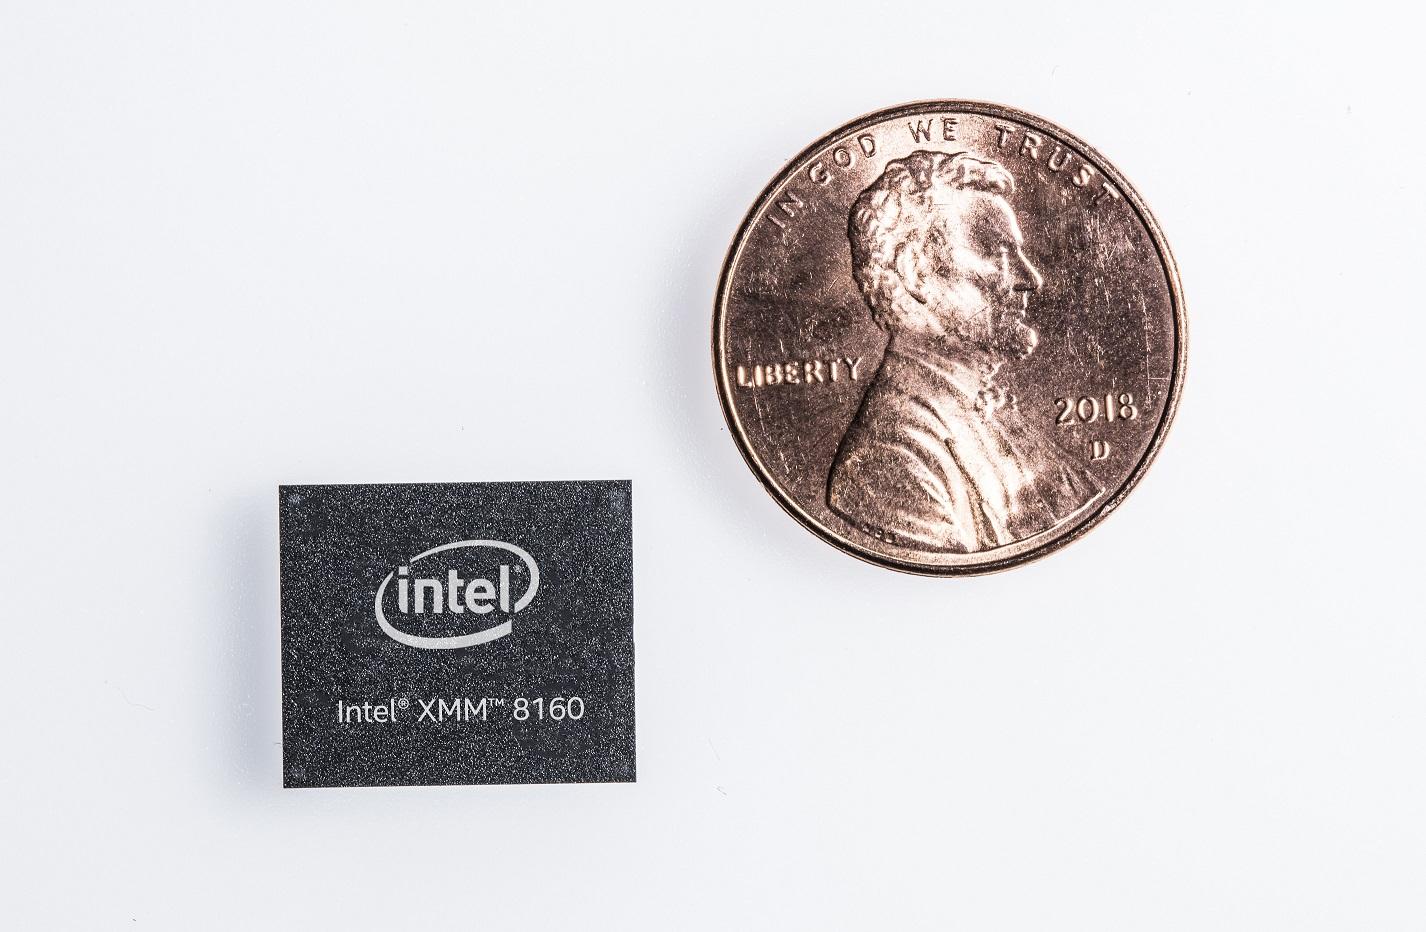 intel-xmm-8160-modem-3_RESIZED